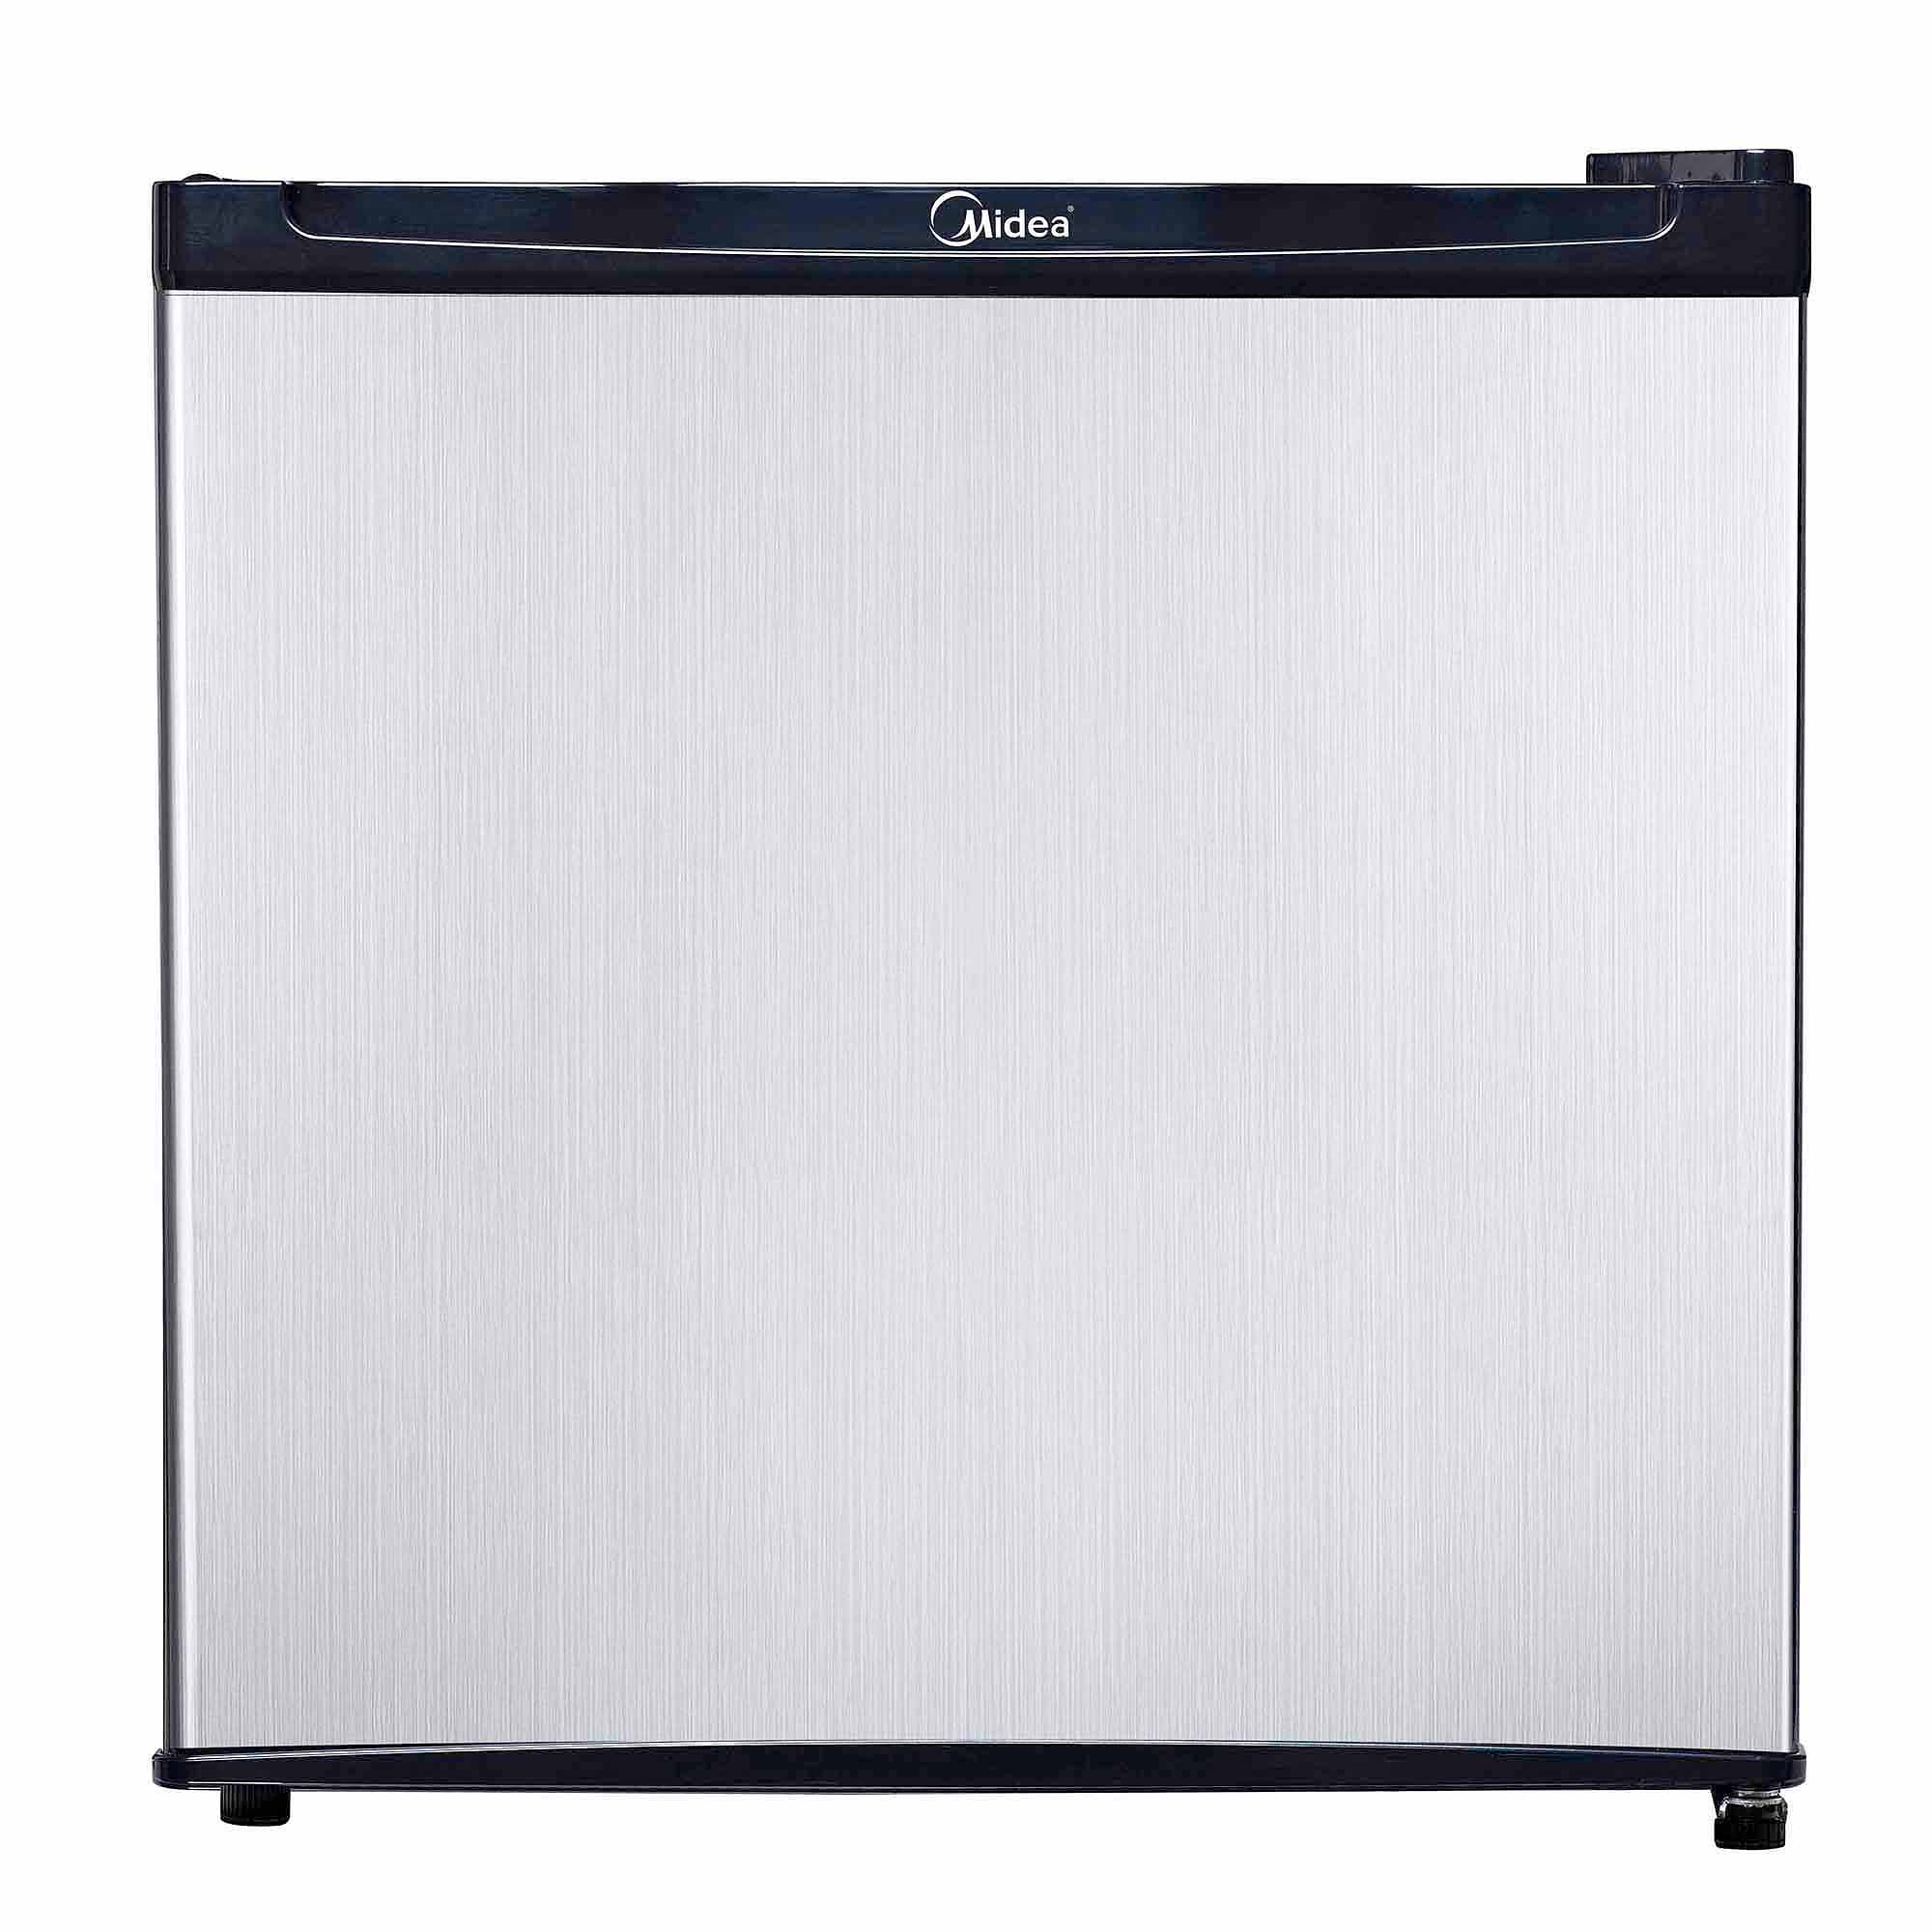 Midea 1.6 Cu. Ft. Compact Refrigerator with Reversible Door & Recessed Handle, Stainless Steel.